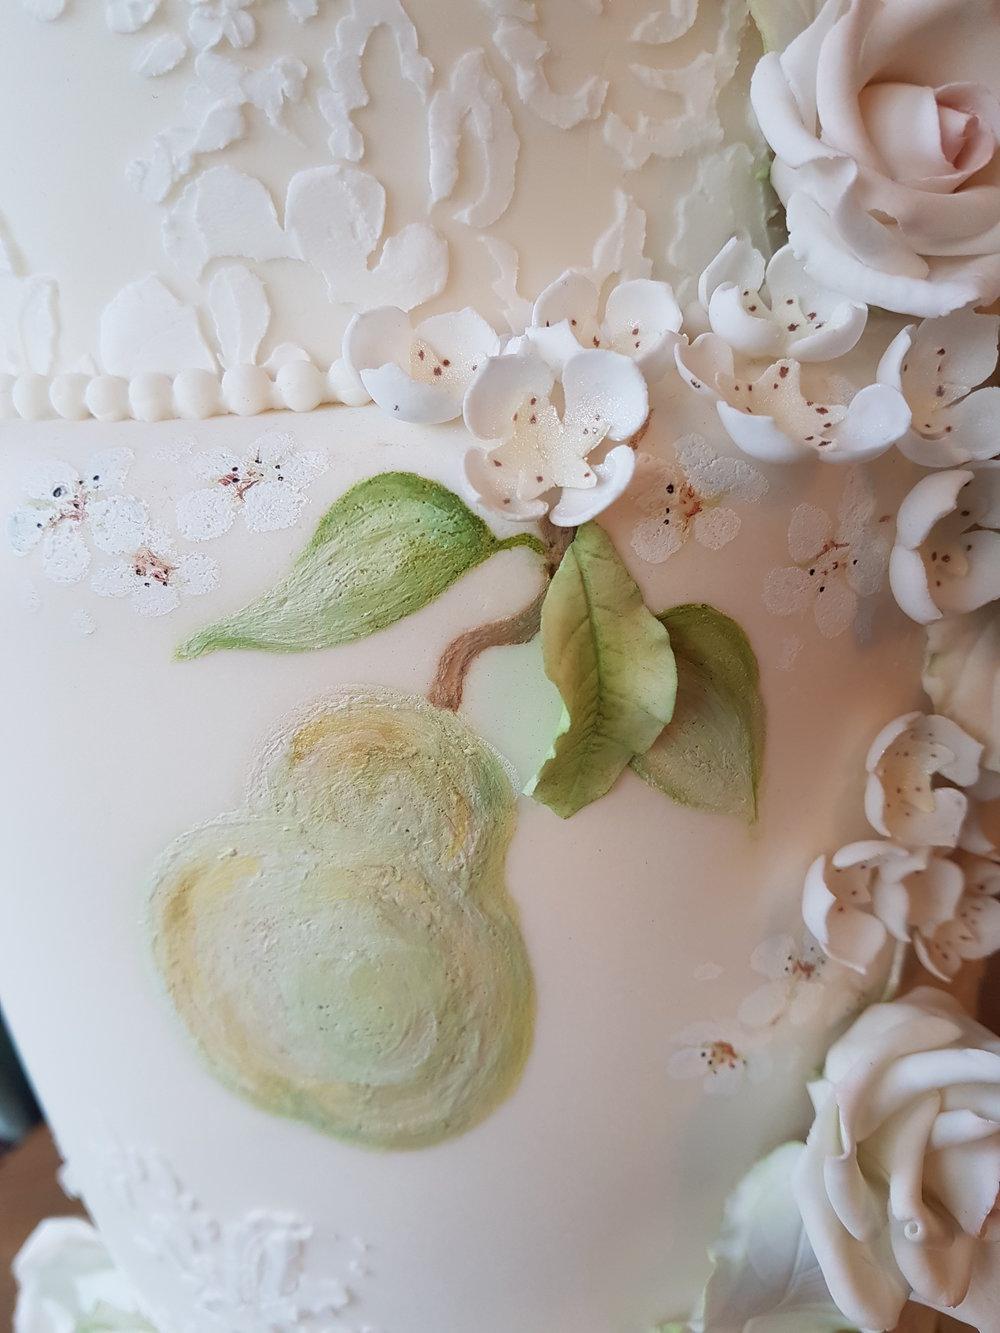 Secret Garden - Hand-painting